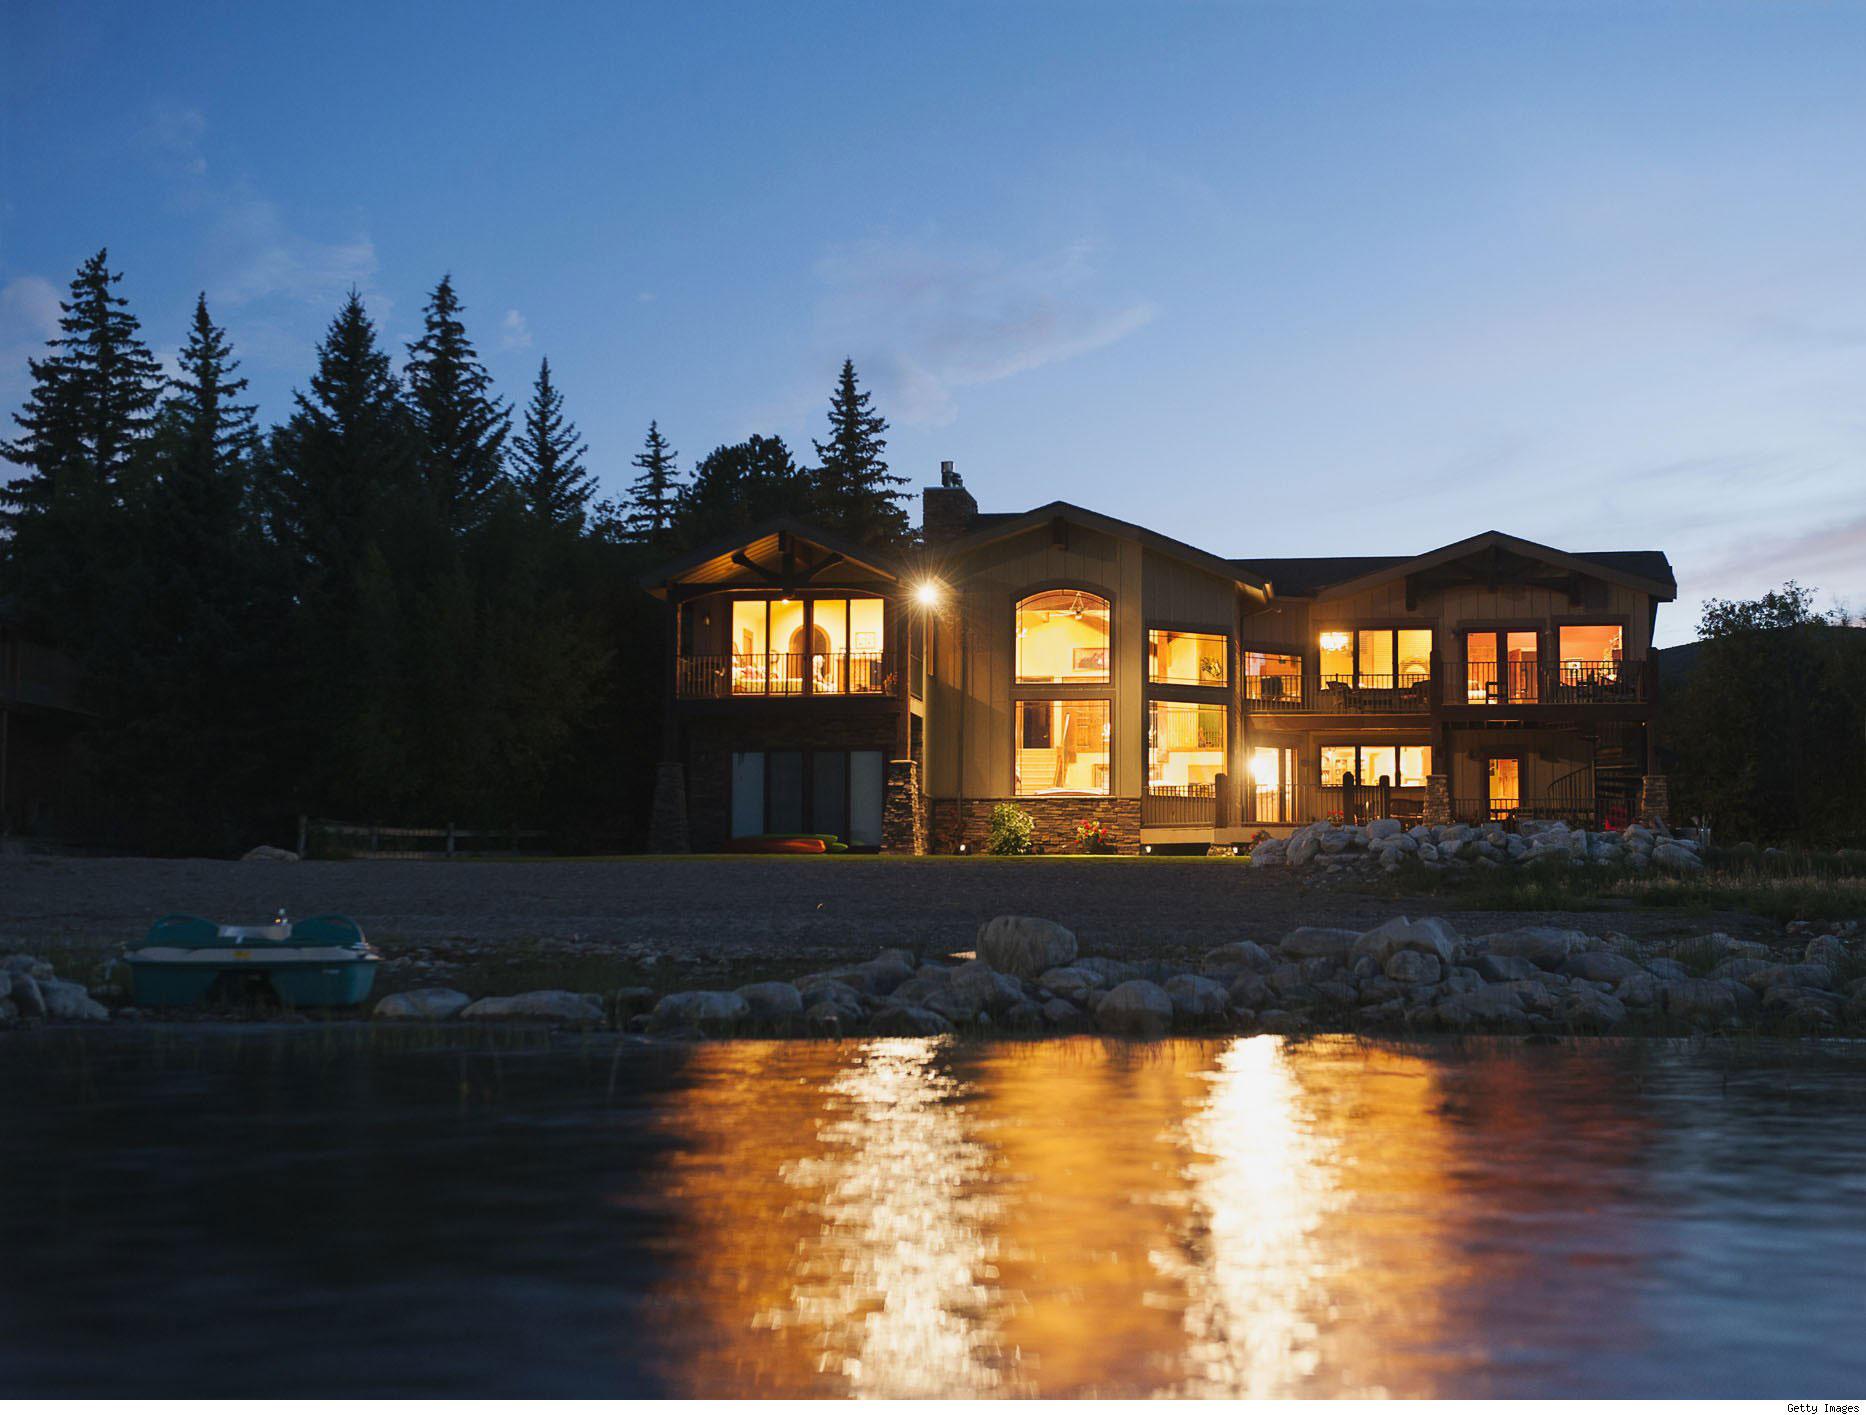 Lake-Cabin-Design-Ideas-That-Will-Inspire-11 Lake Cabin Design-Ideas som kommer att inspirera dig